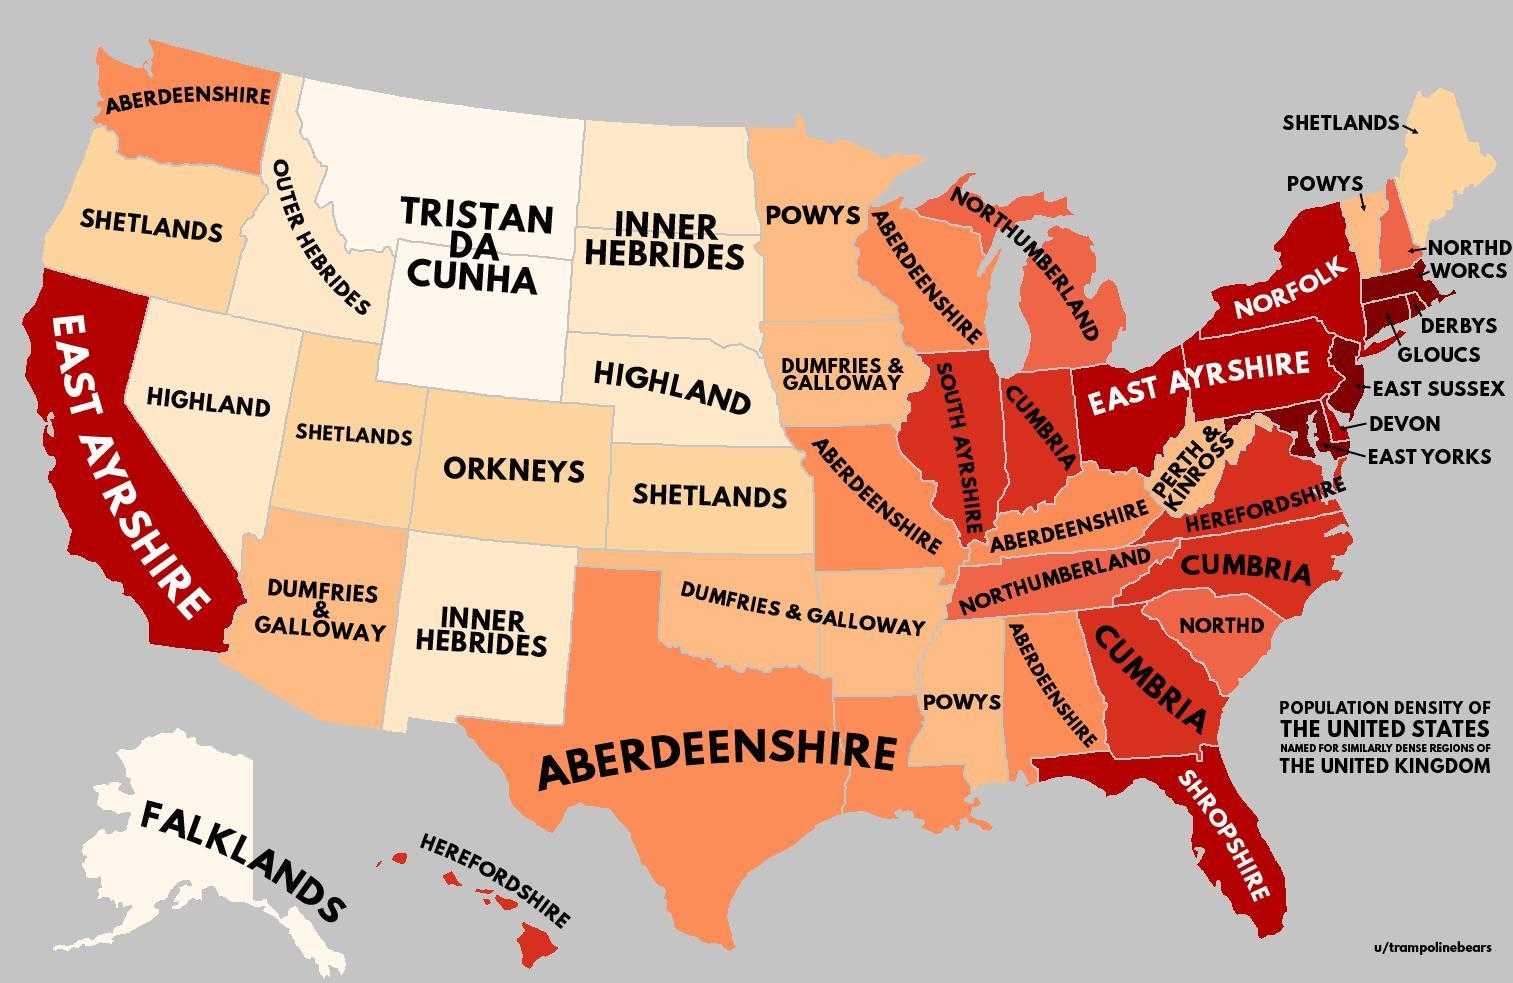 Worksheet. Population density of United States with United Kingdom